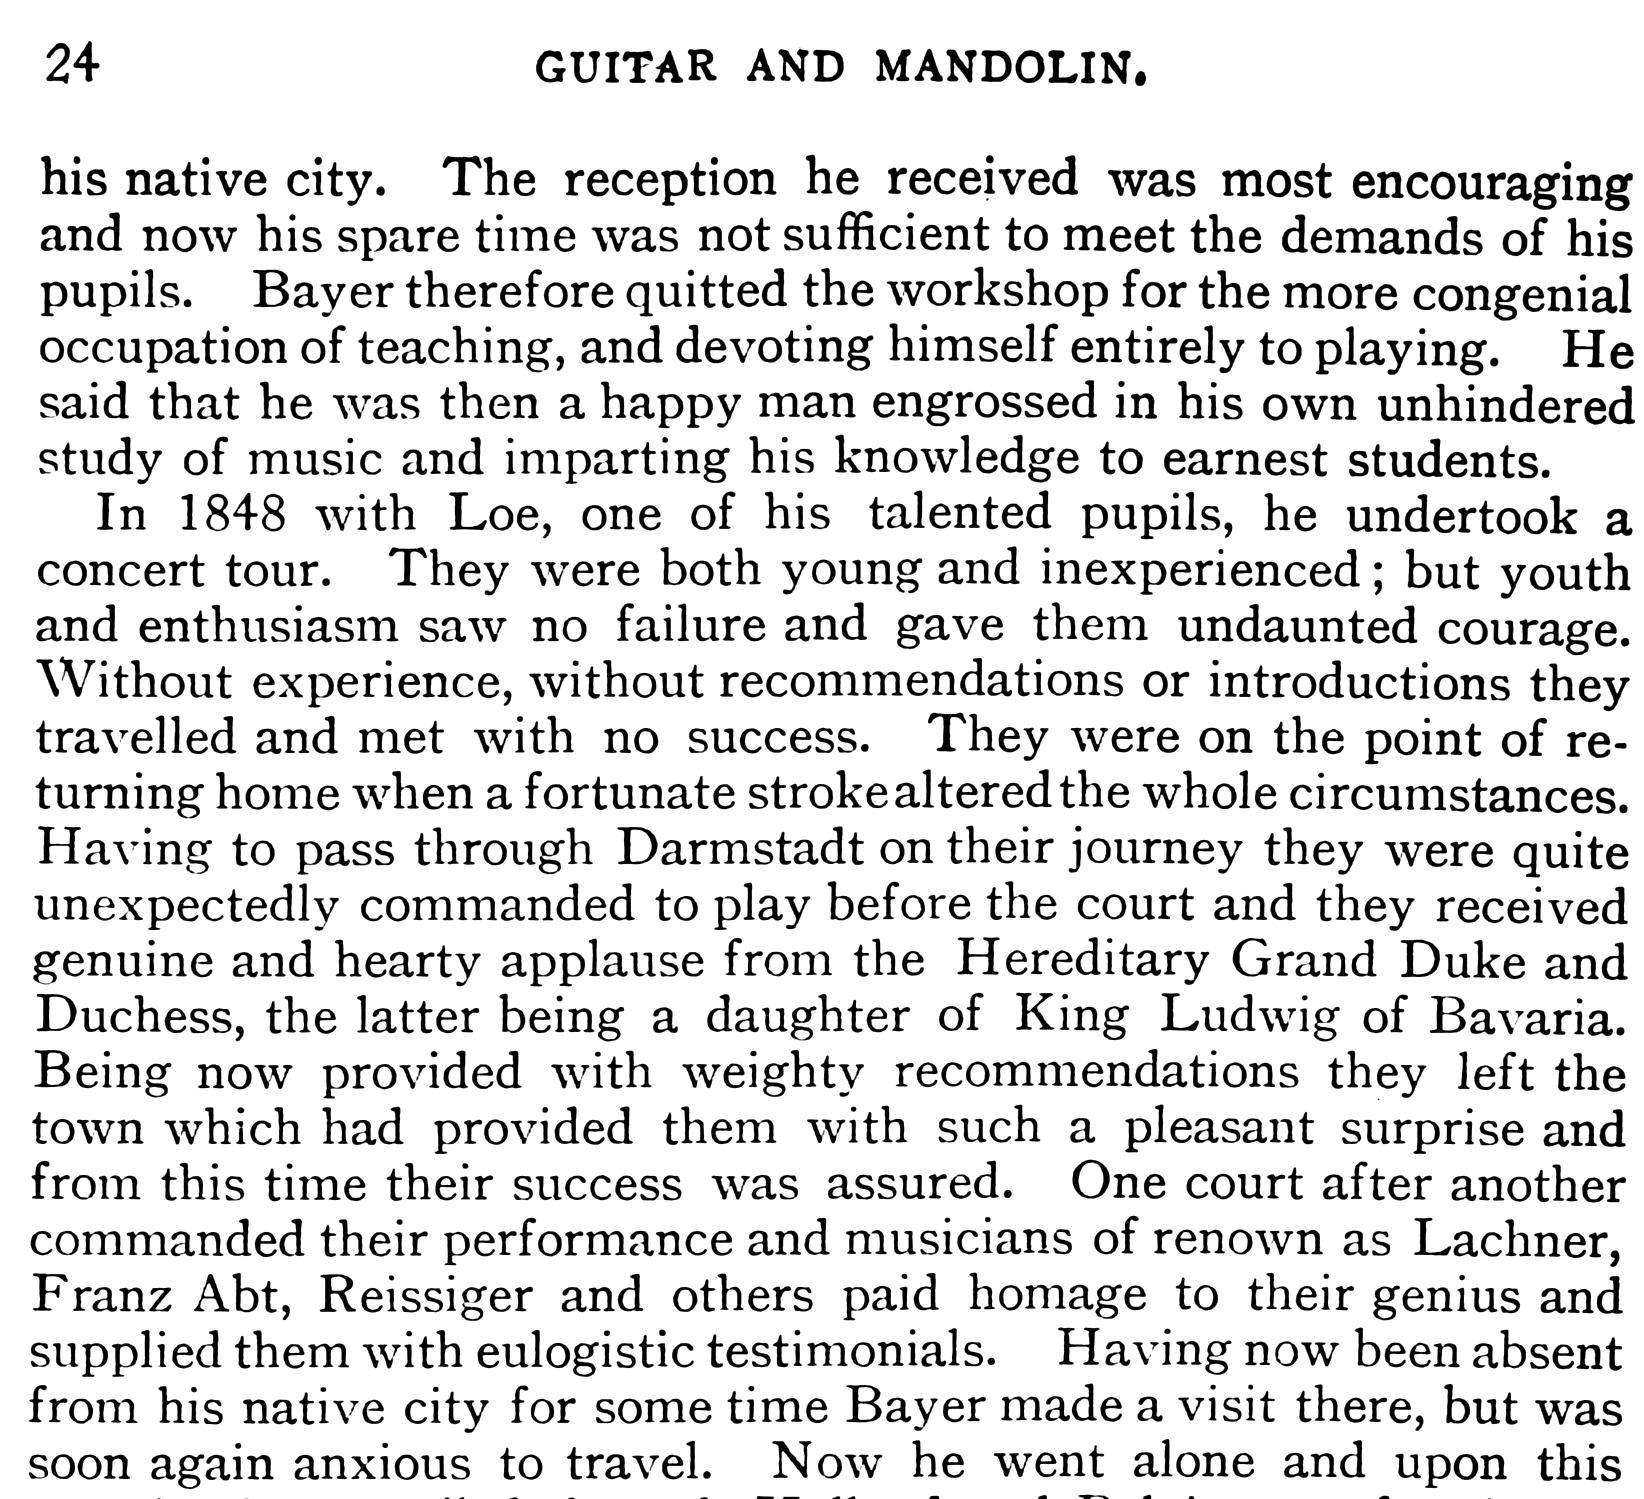 Biography of Eduard Bayer - Part 2